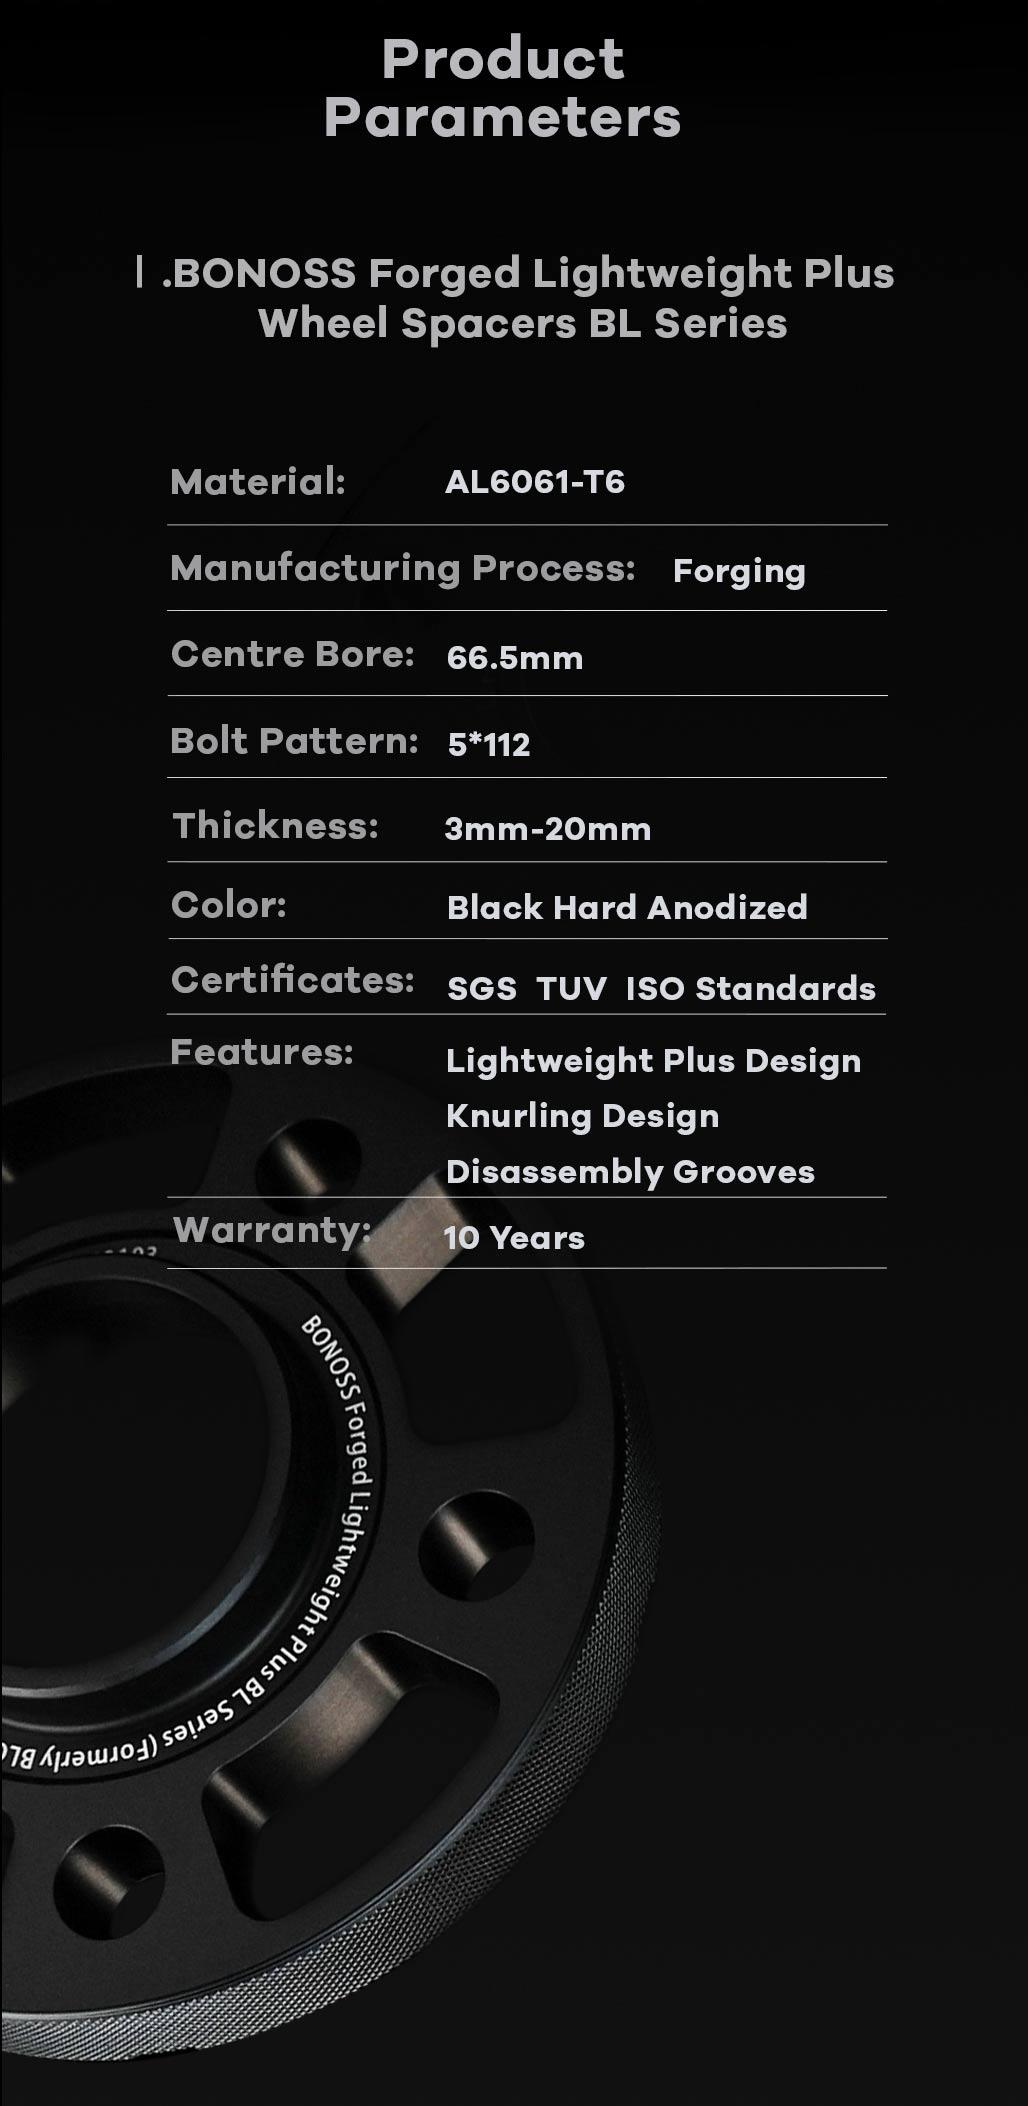 AL6061-T6-BONOSS-forged-lightweight-plus-hubcentric-5x112-66.5-ET-wheel-spacers-14x1.25-by-lulu-9-jpg